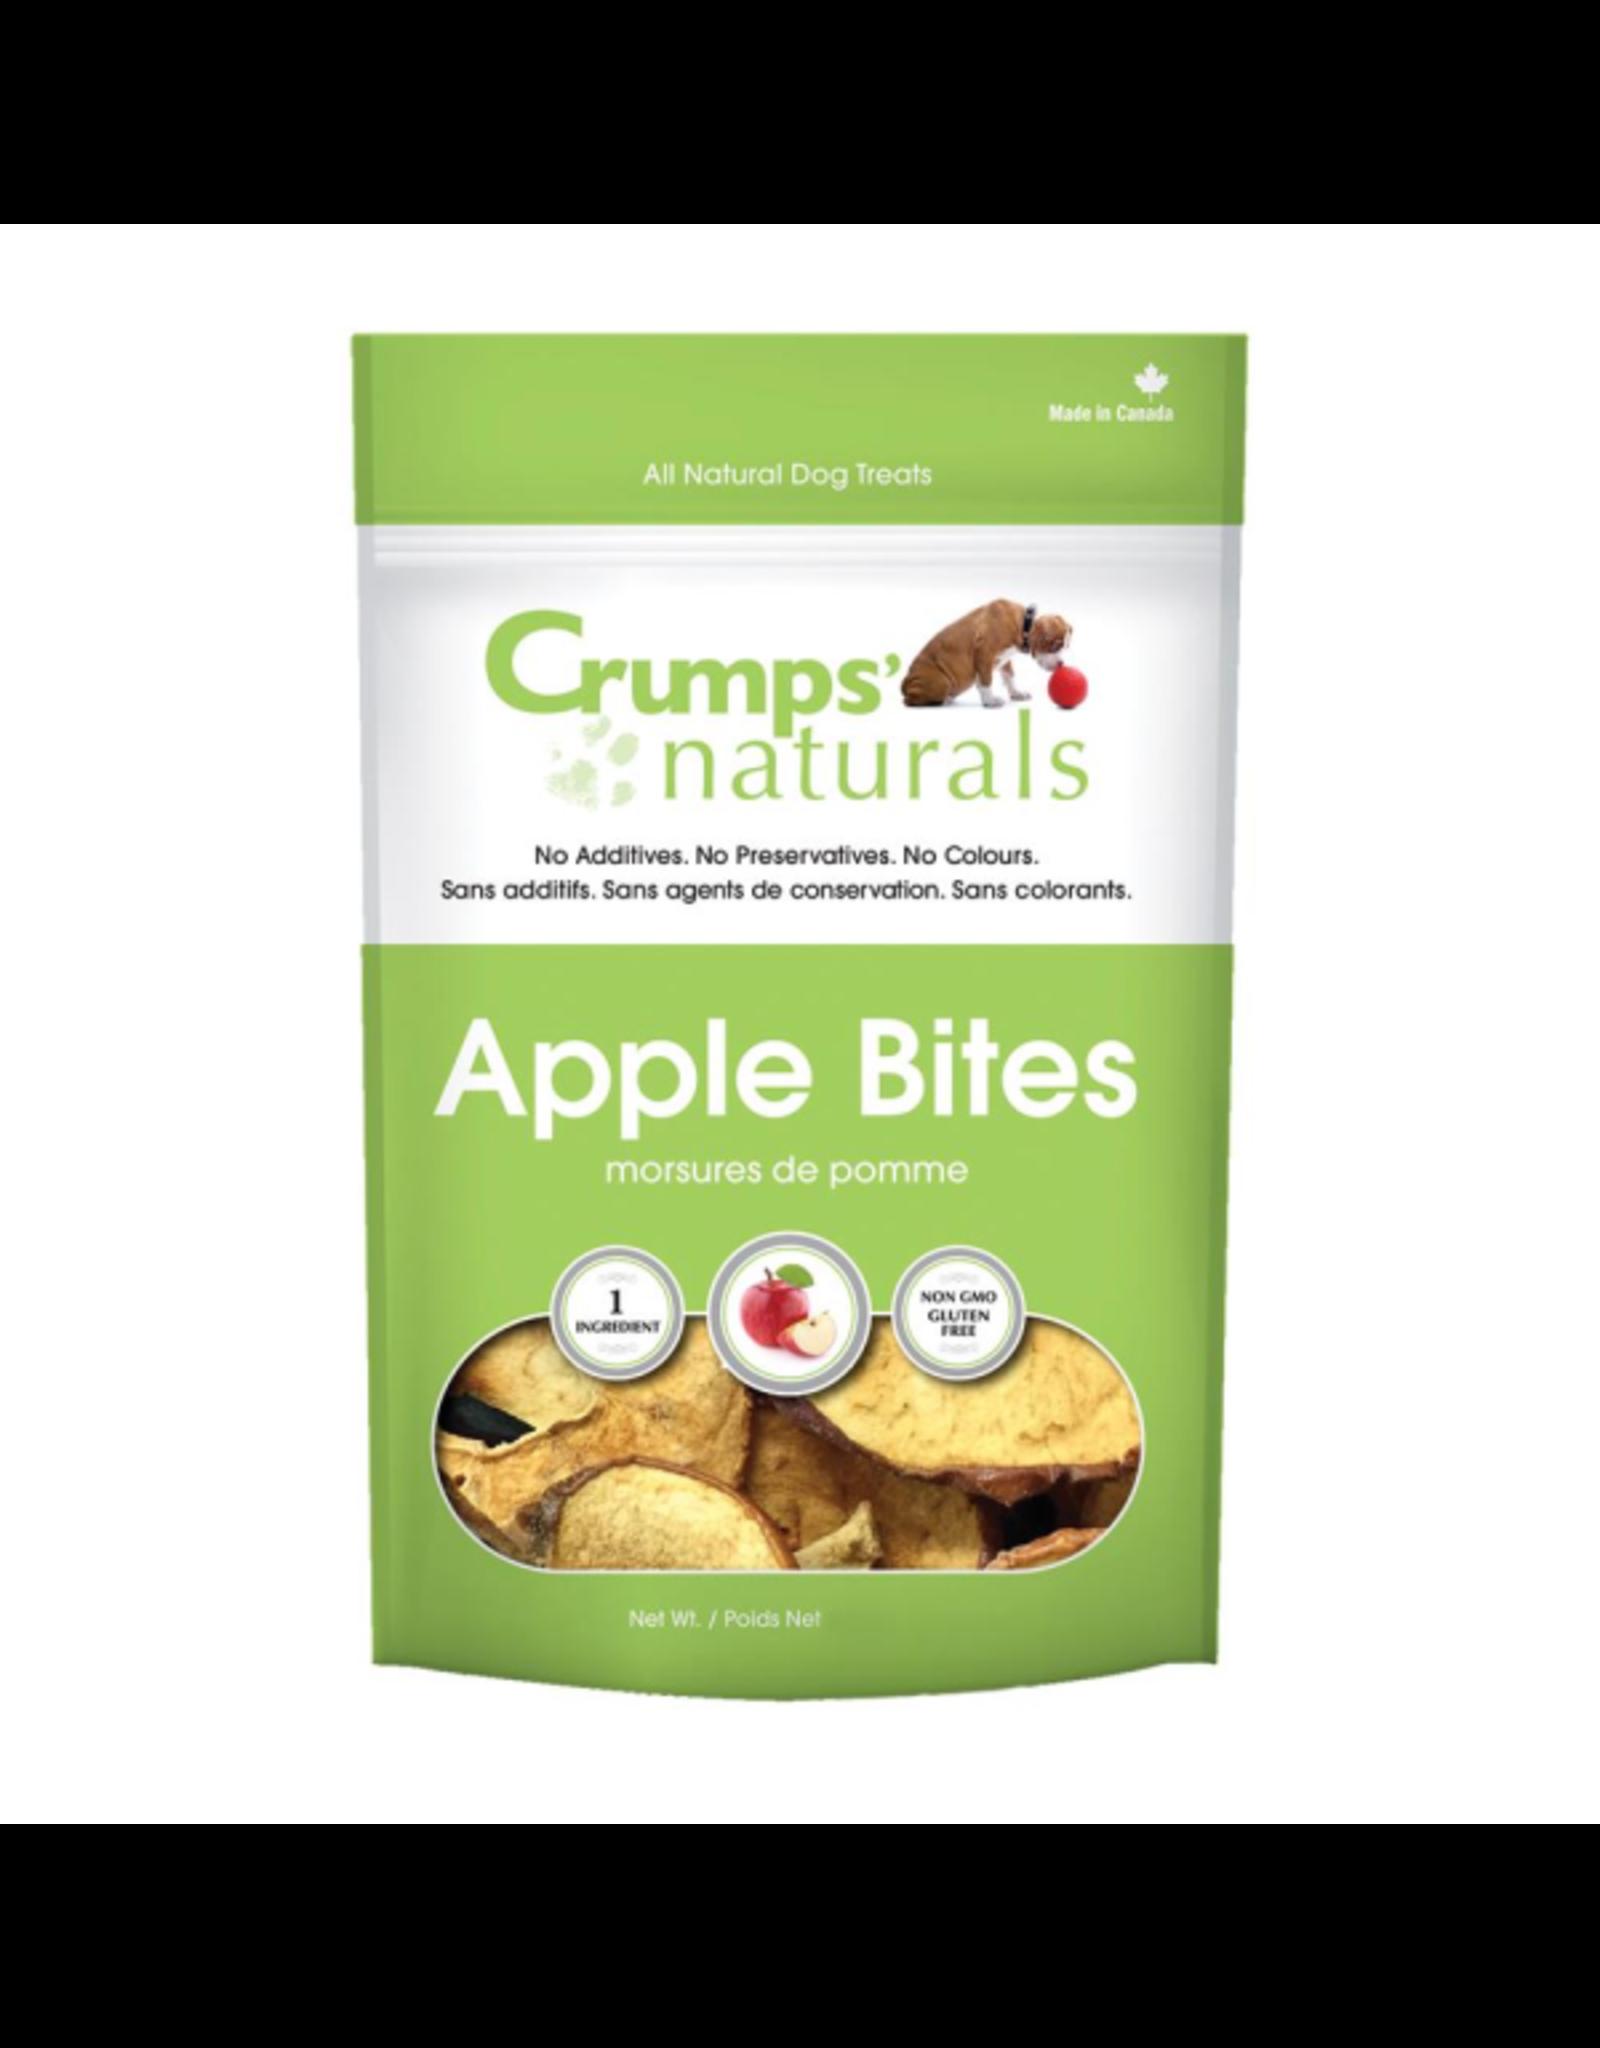 Crumps Apple Bites